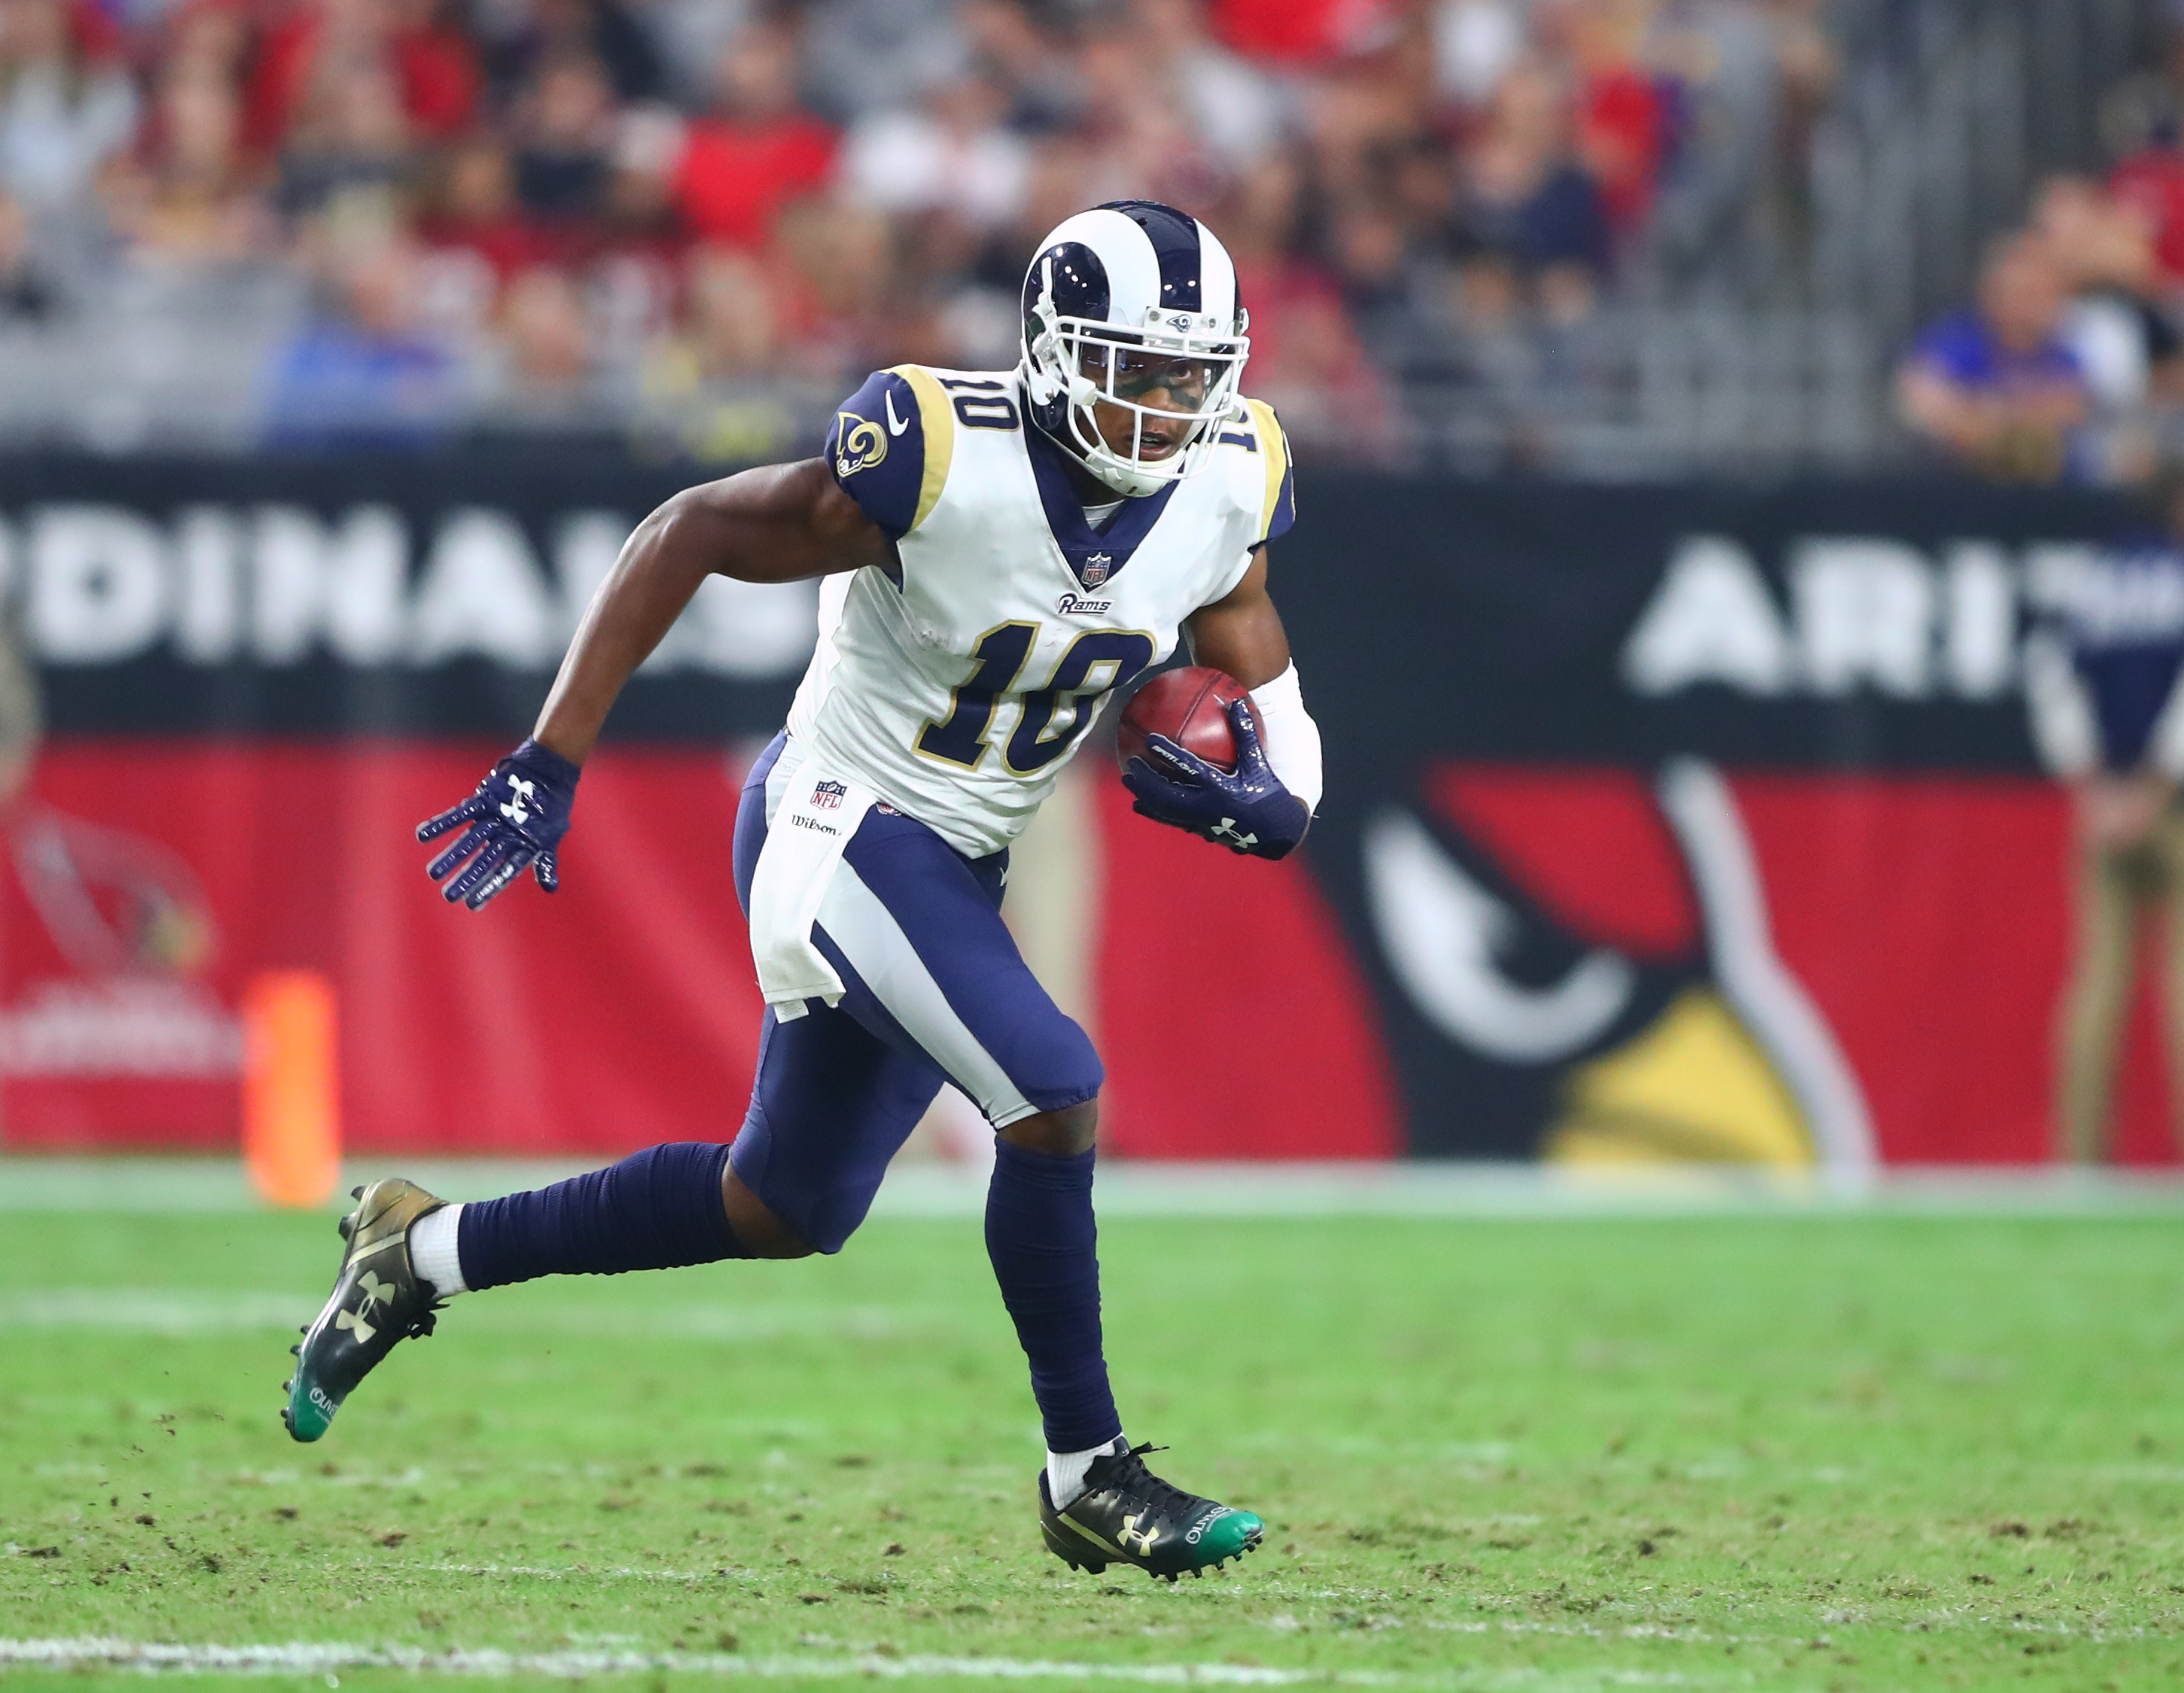 Los Angeles Rams PR Pharoh Cooper returns a kick against the Arizona Cardinals in Week 13